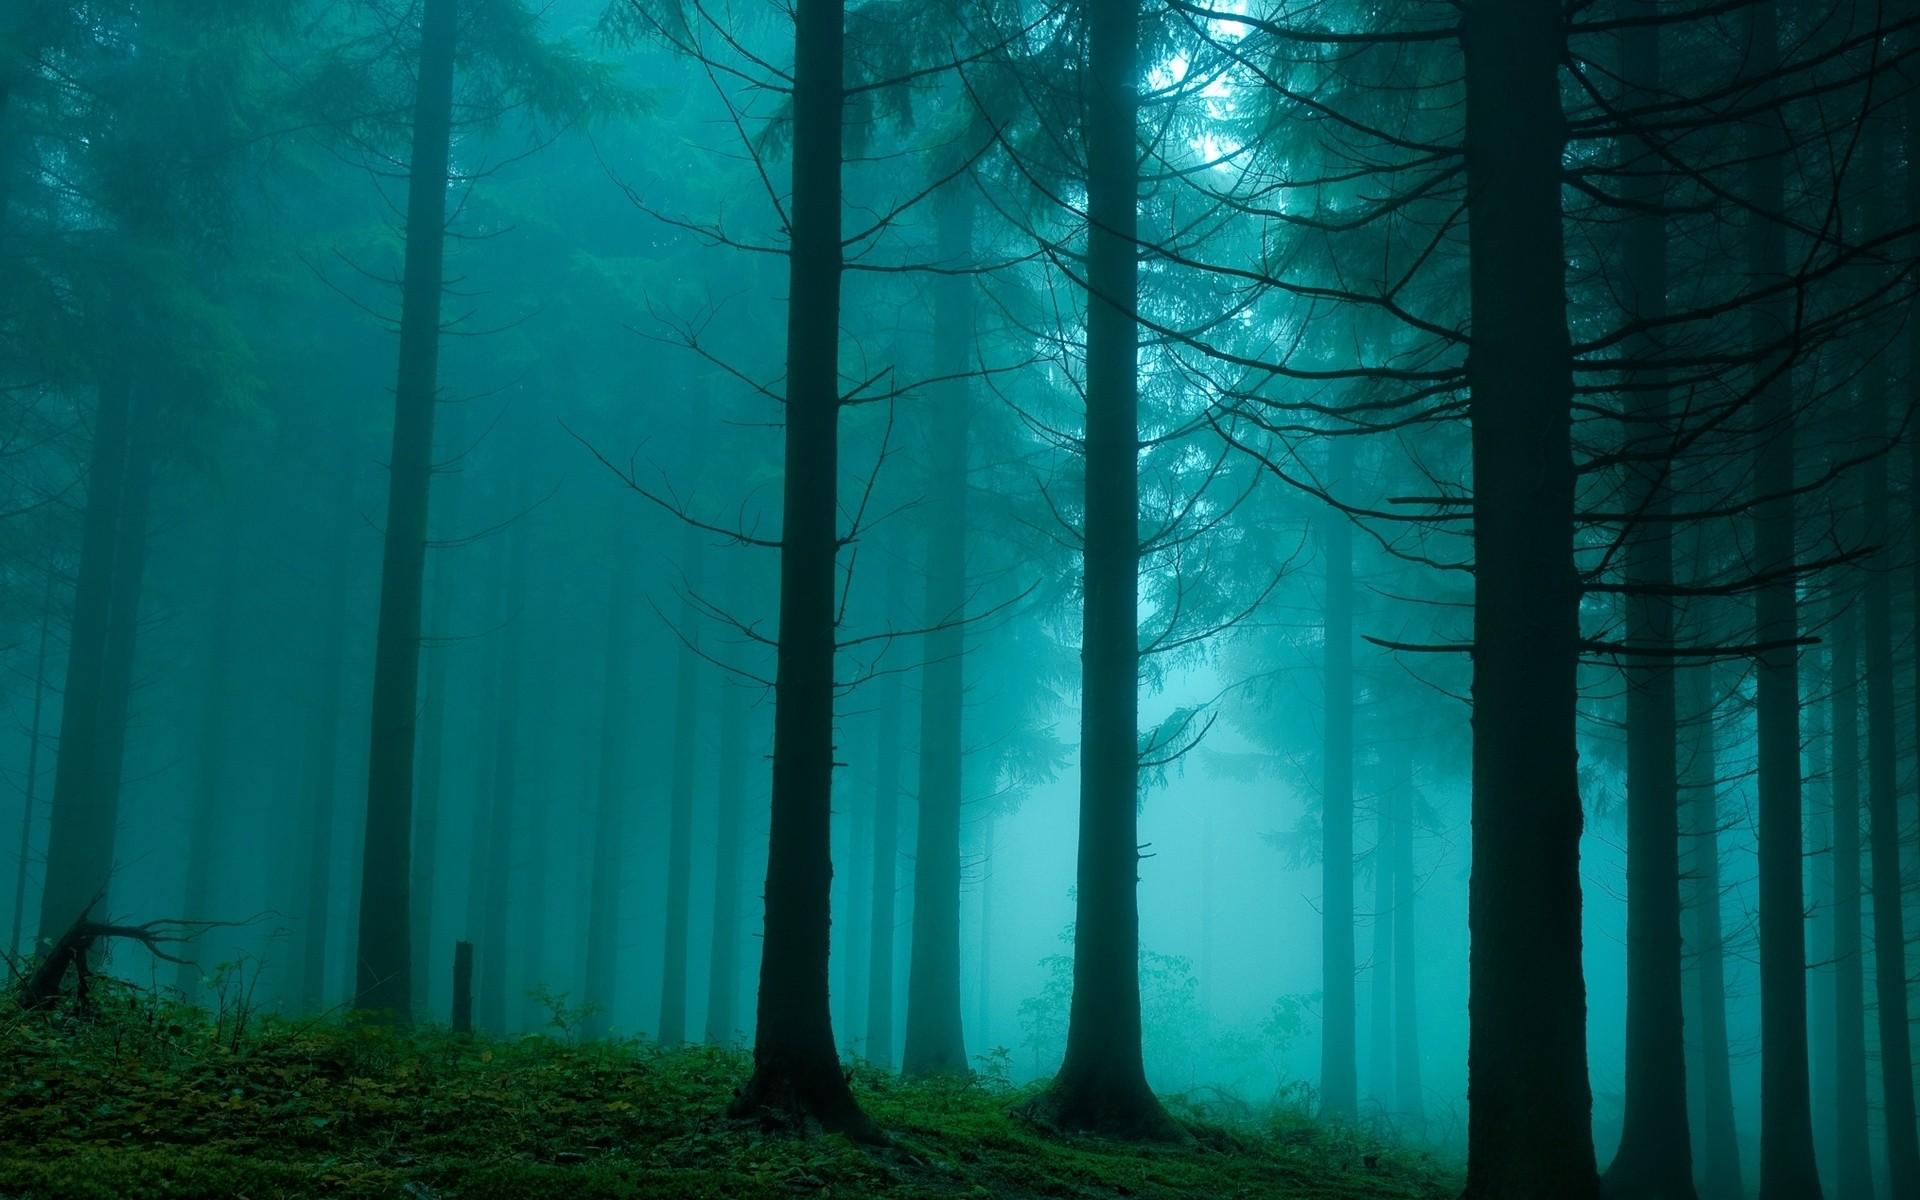 299151436_foggy_forest_wallpaper_7_122_209lo.jpg